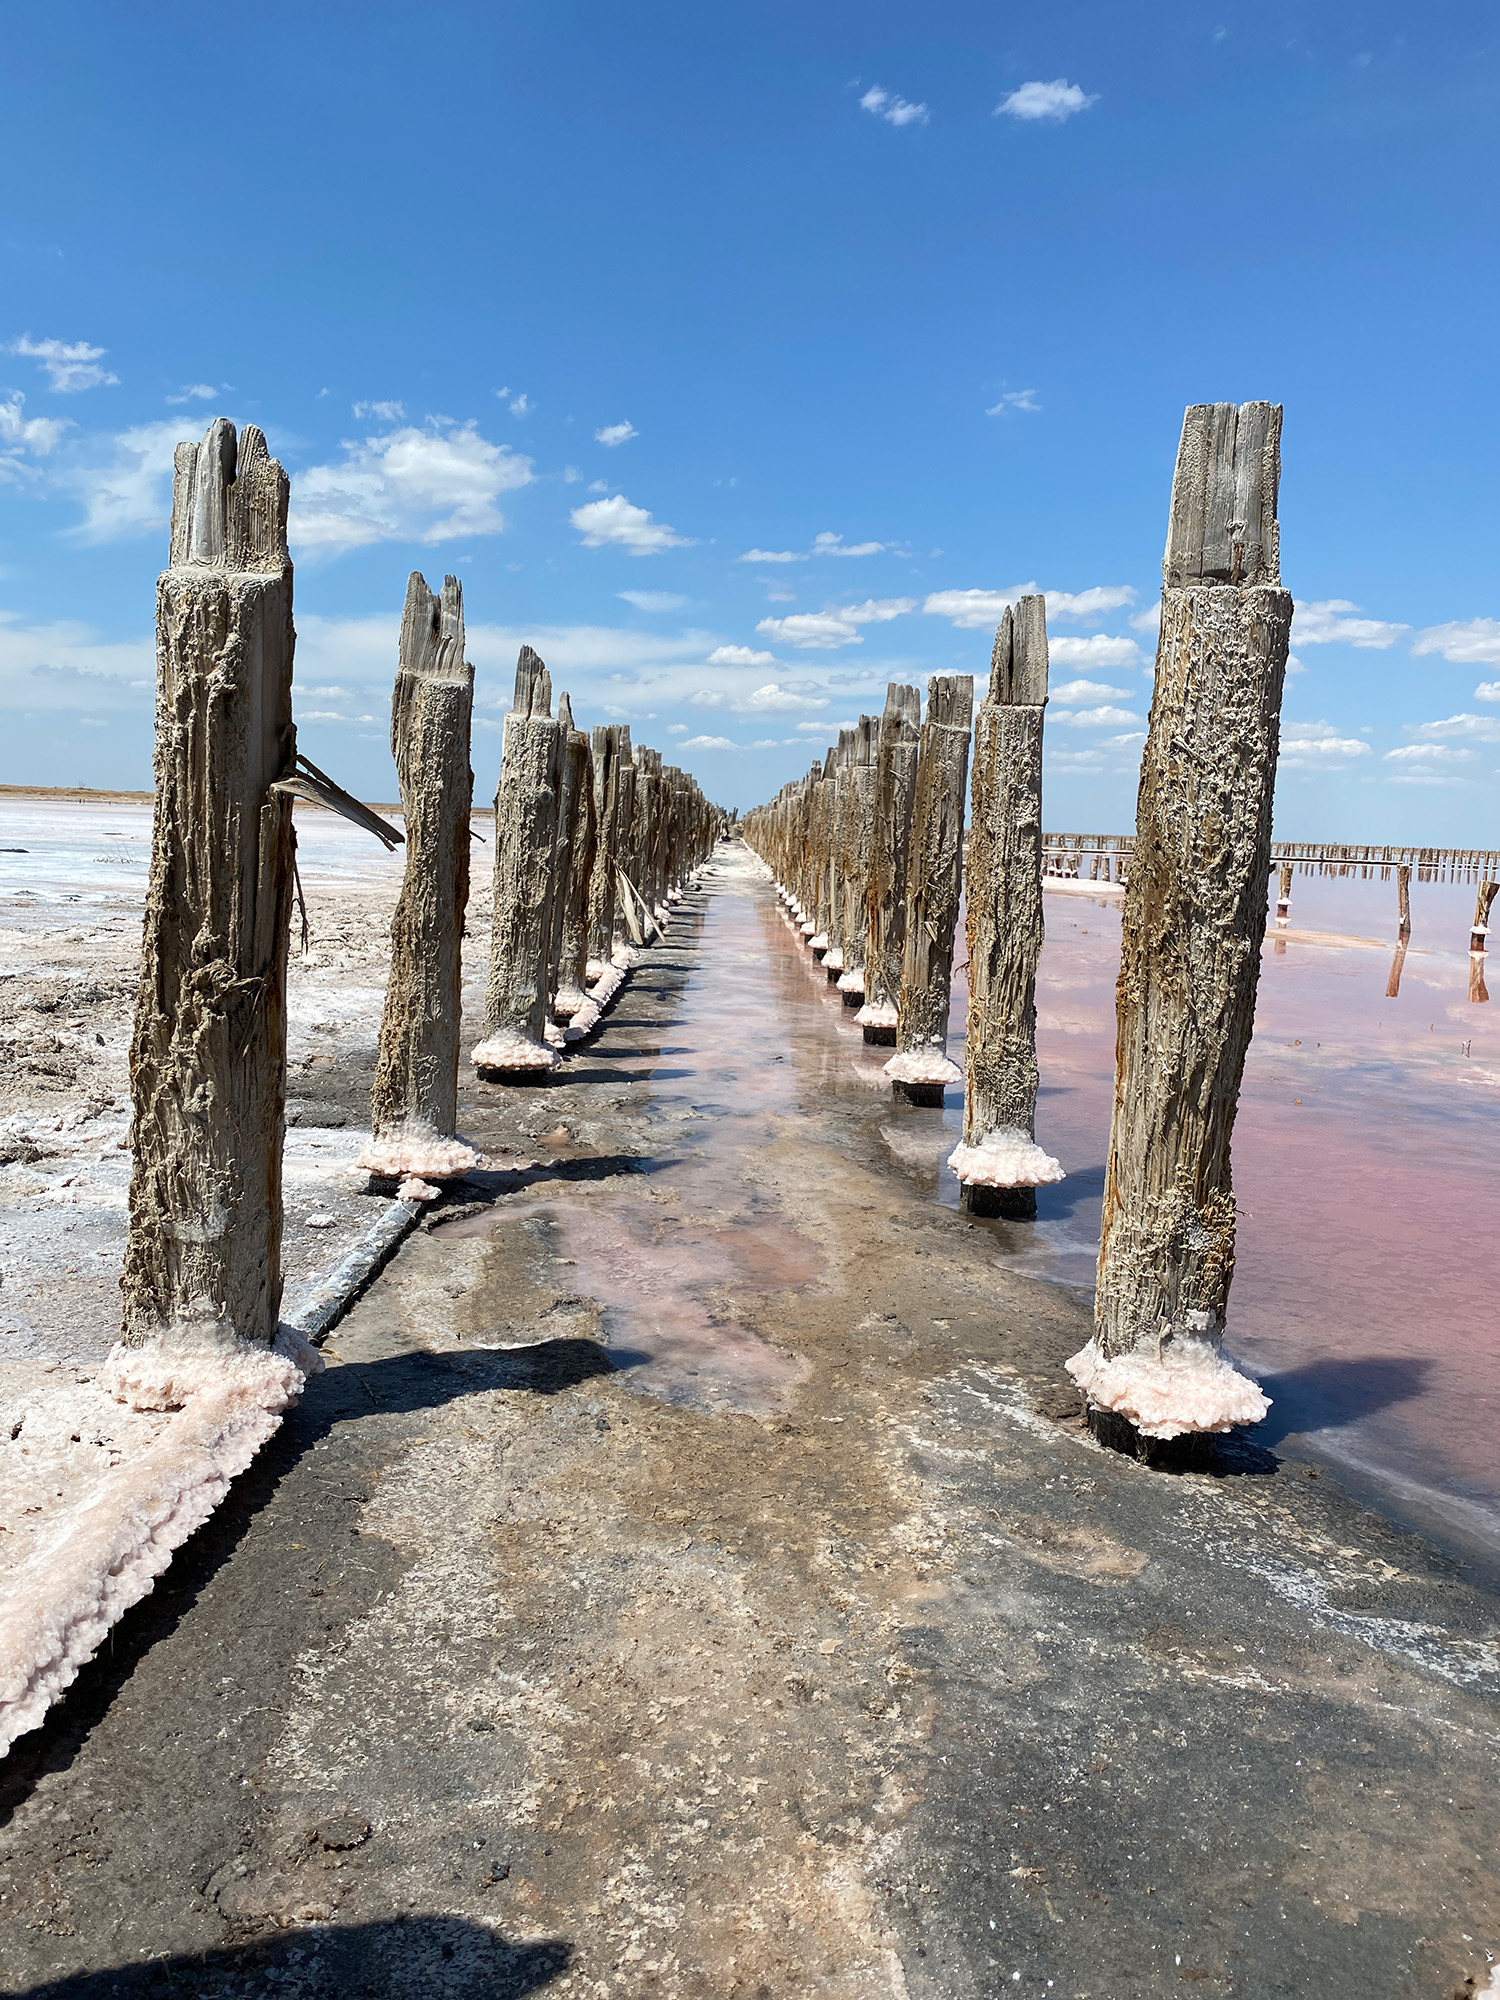 Рожеве озеро - генічеське озеро